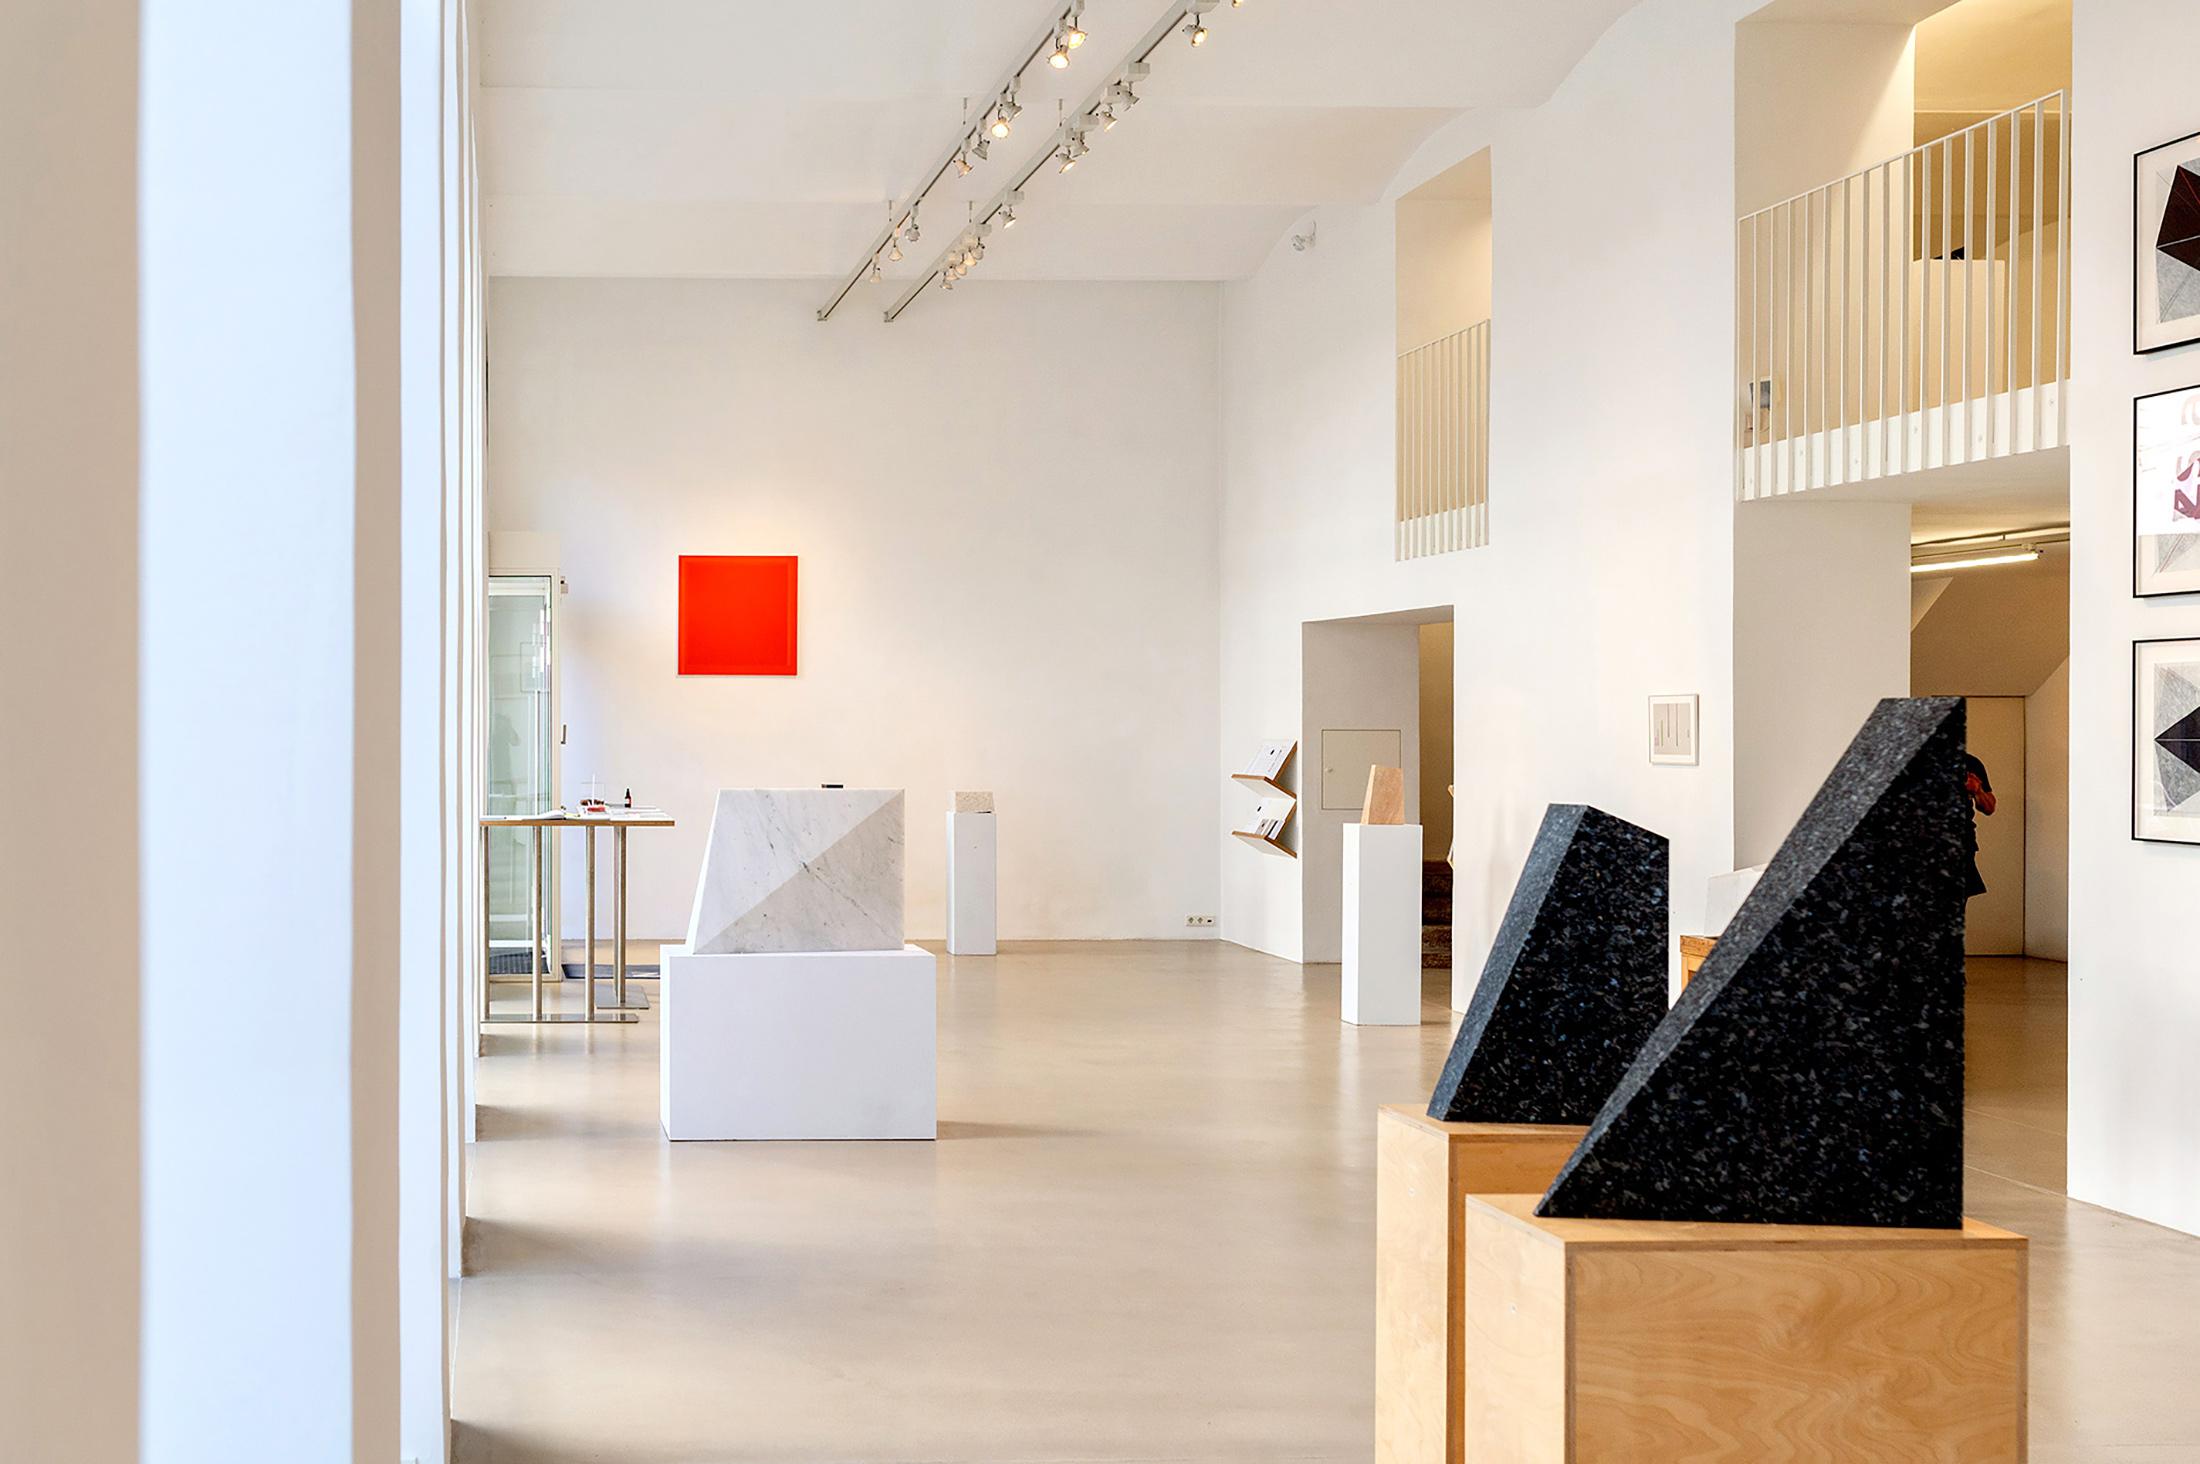 zs art gallery, vienna, group show